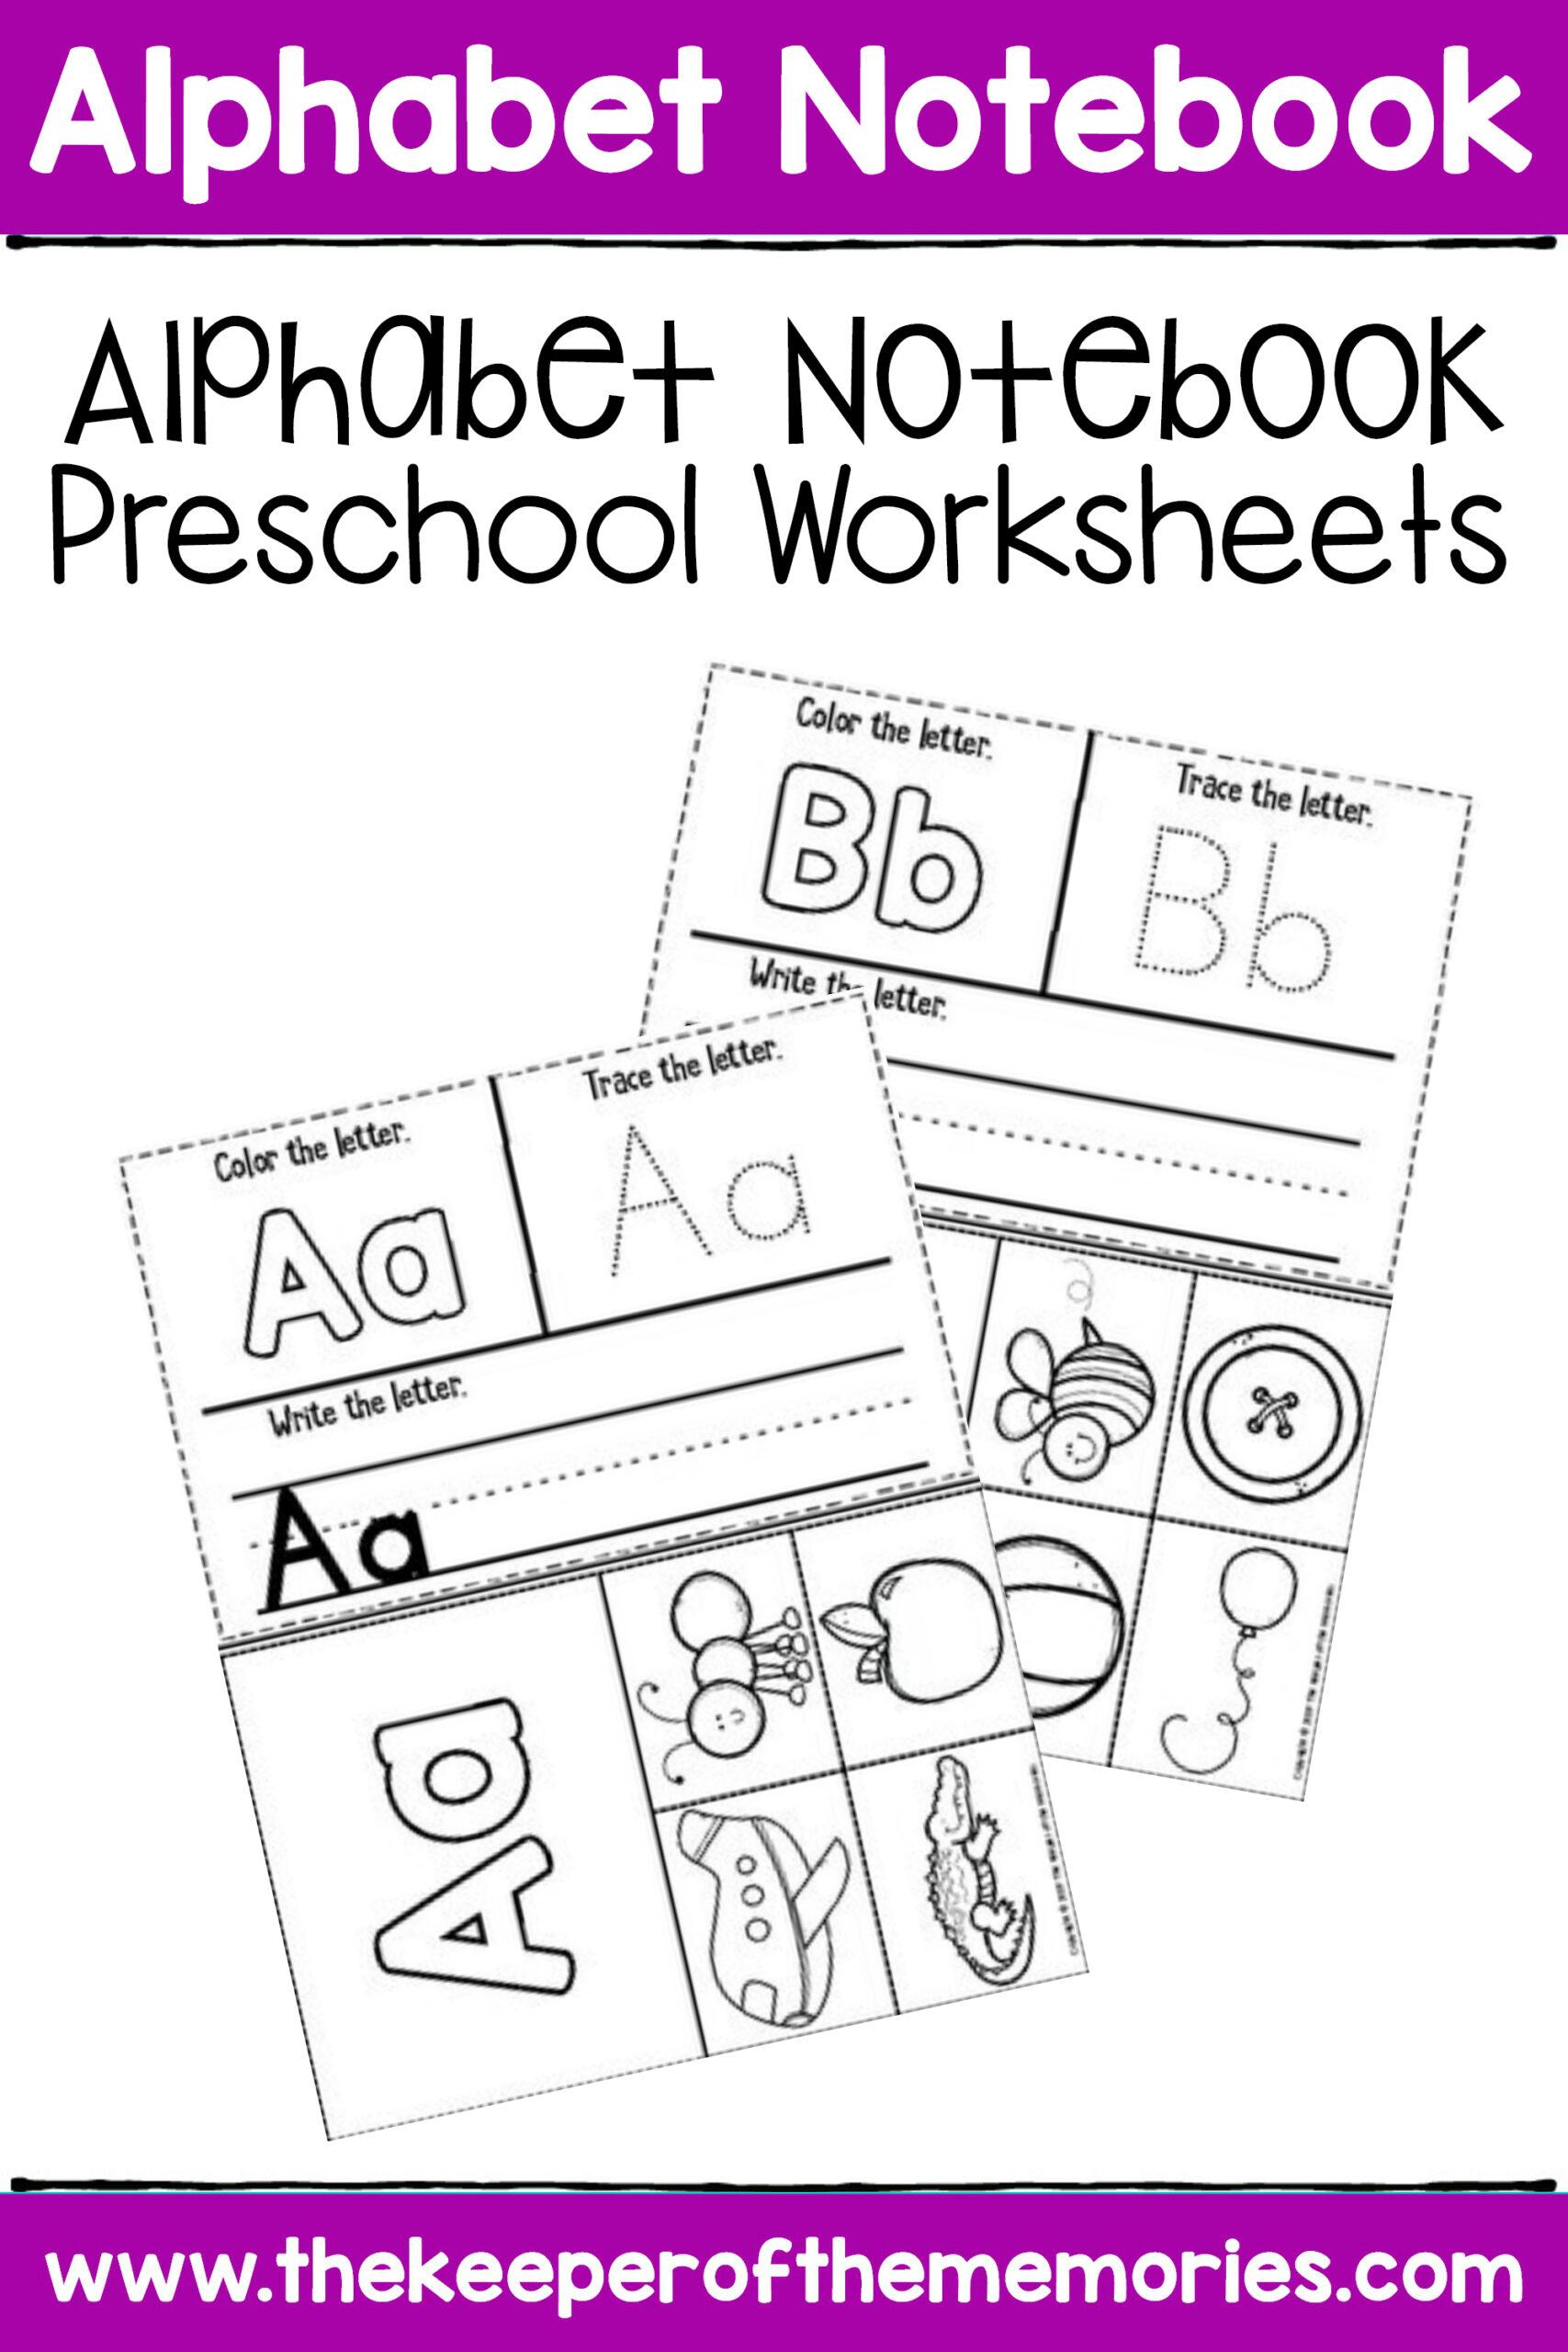 Free Printable Alphabet Notebook Preschool Worksheets regarding Letter Tracing Interactive